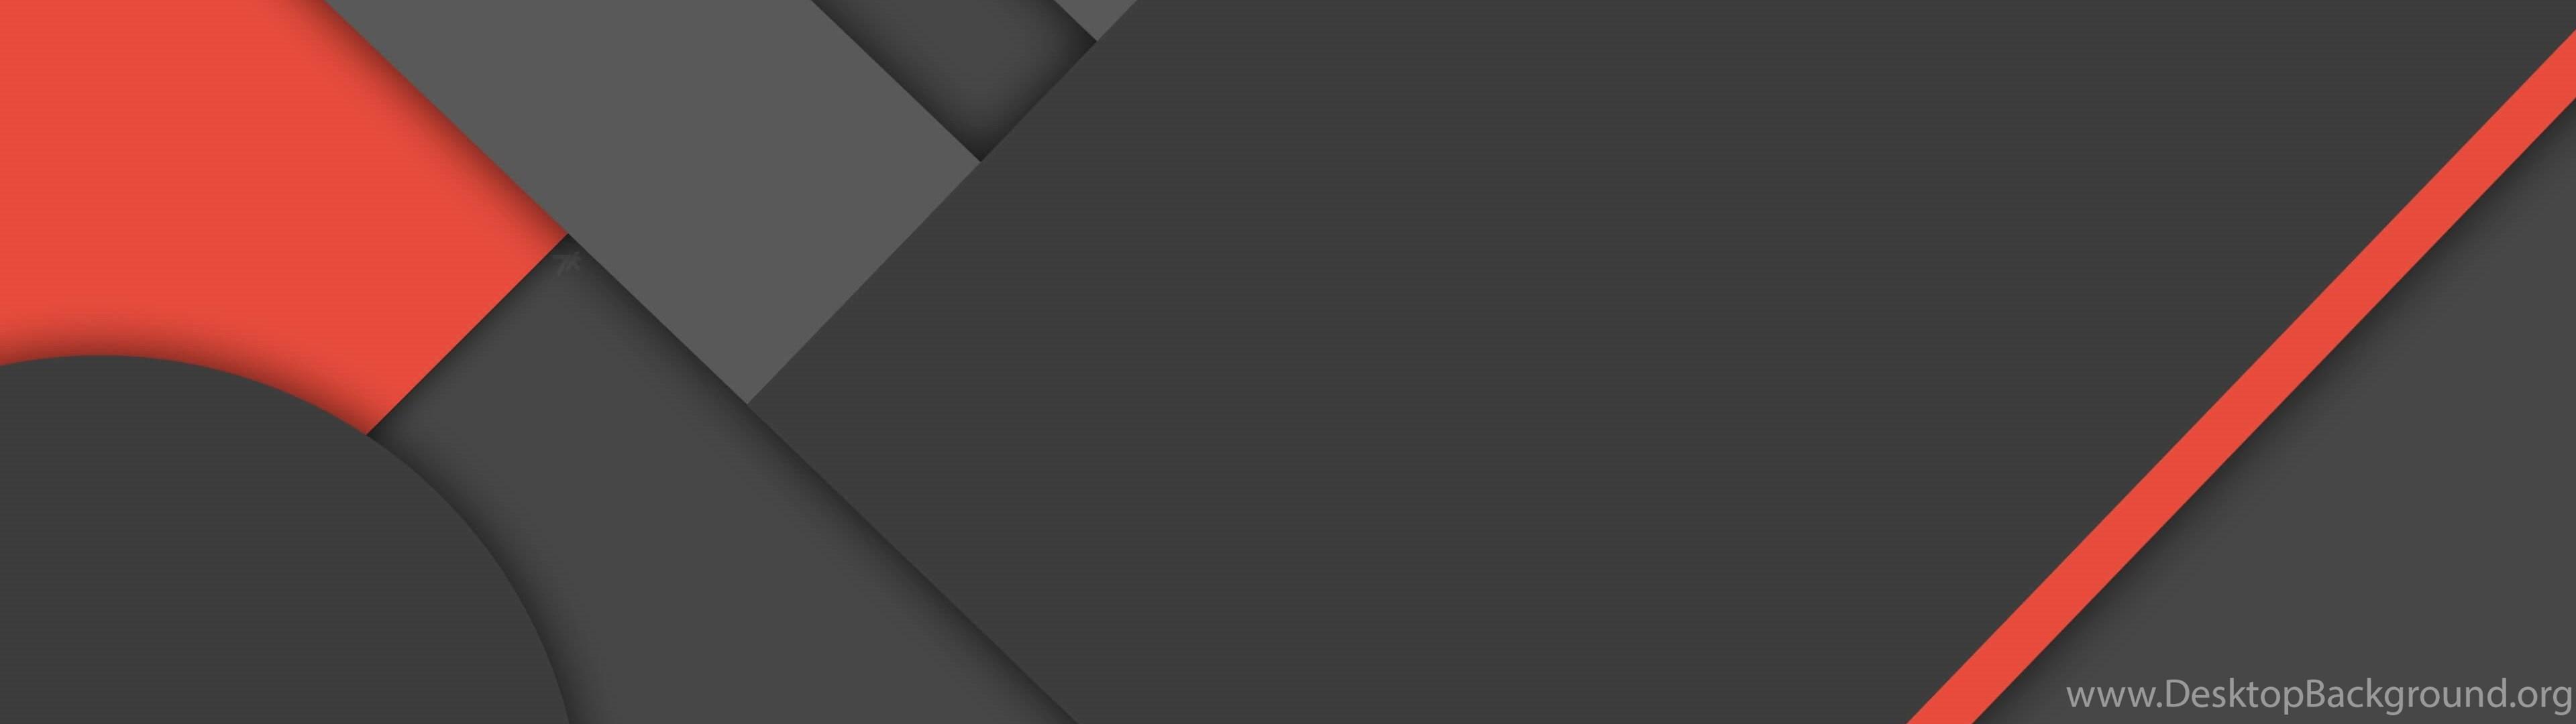 Dark Grey Red Material Design 4k Wallpapers Desktop Background